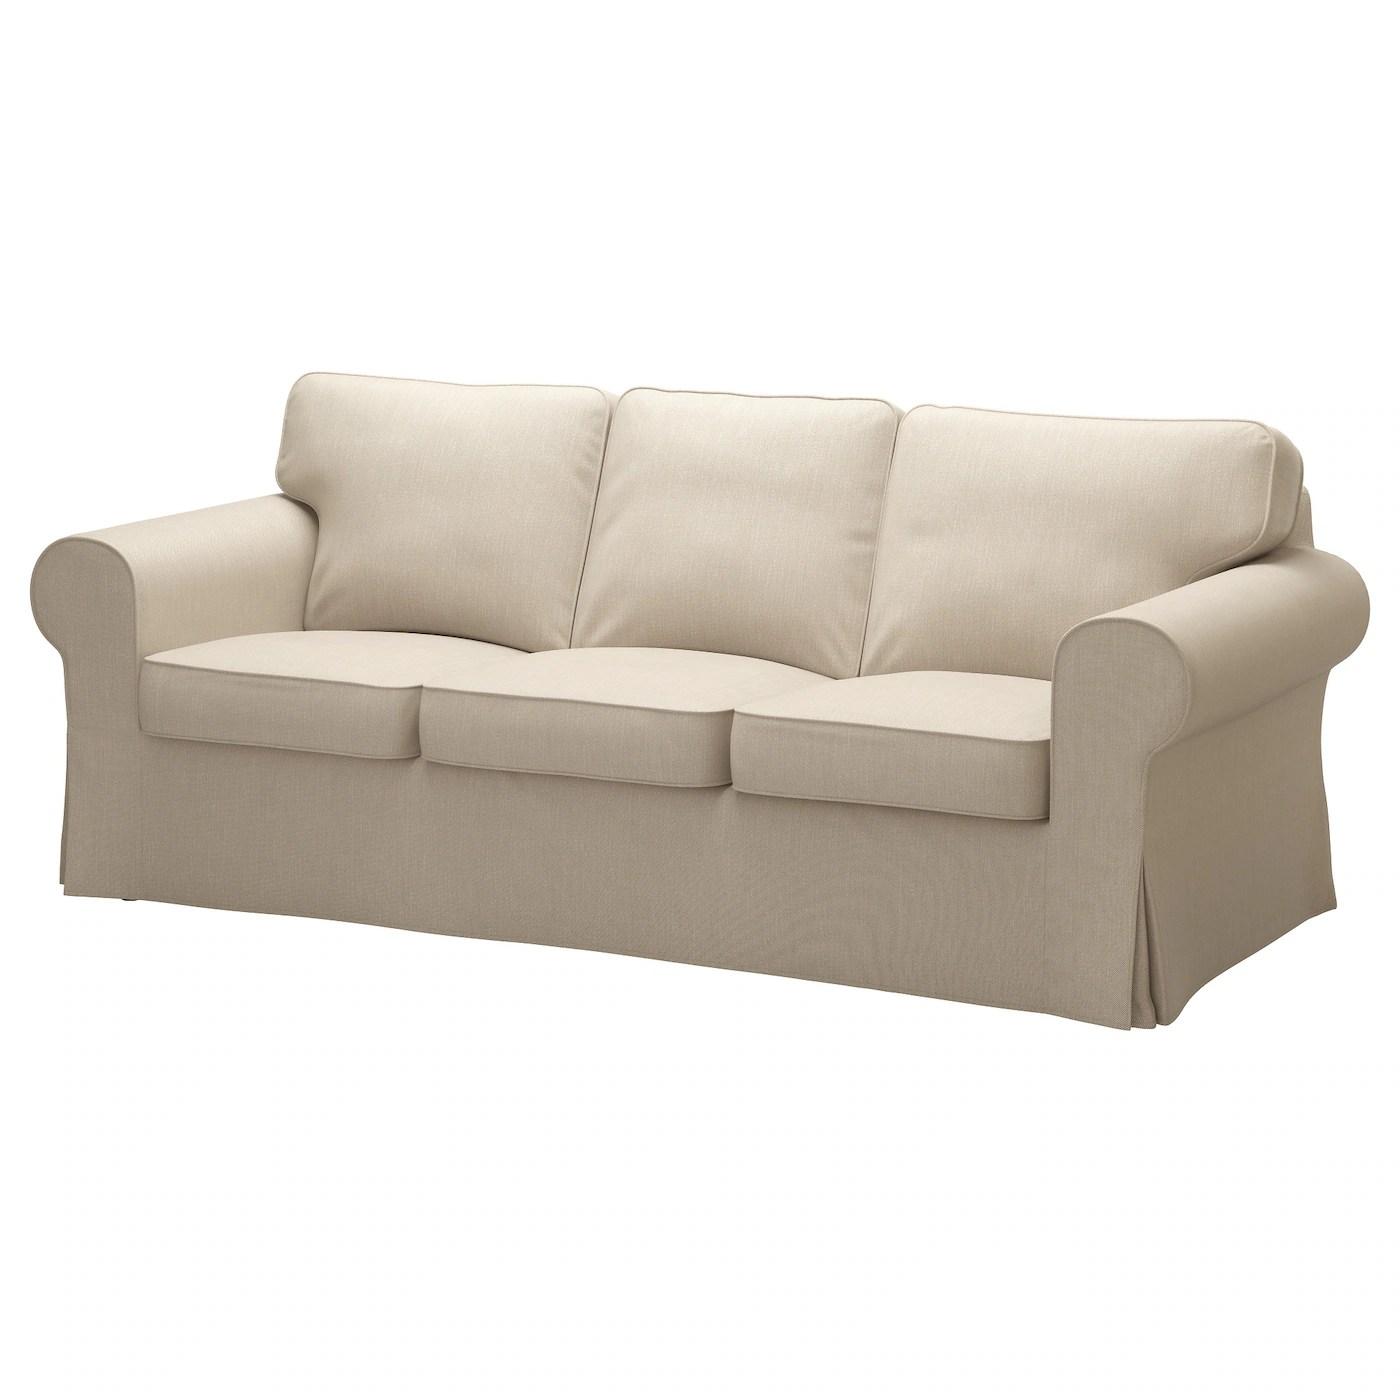 beige chair covers buy kenny chesney blue bay song ektorp cover three seat sofa nordvalla dark ikea